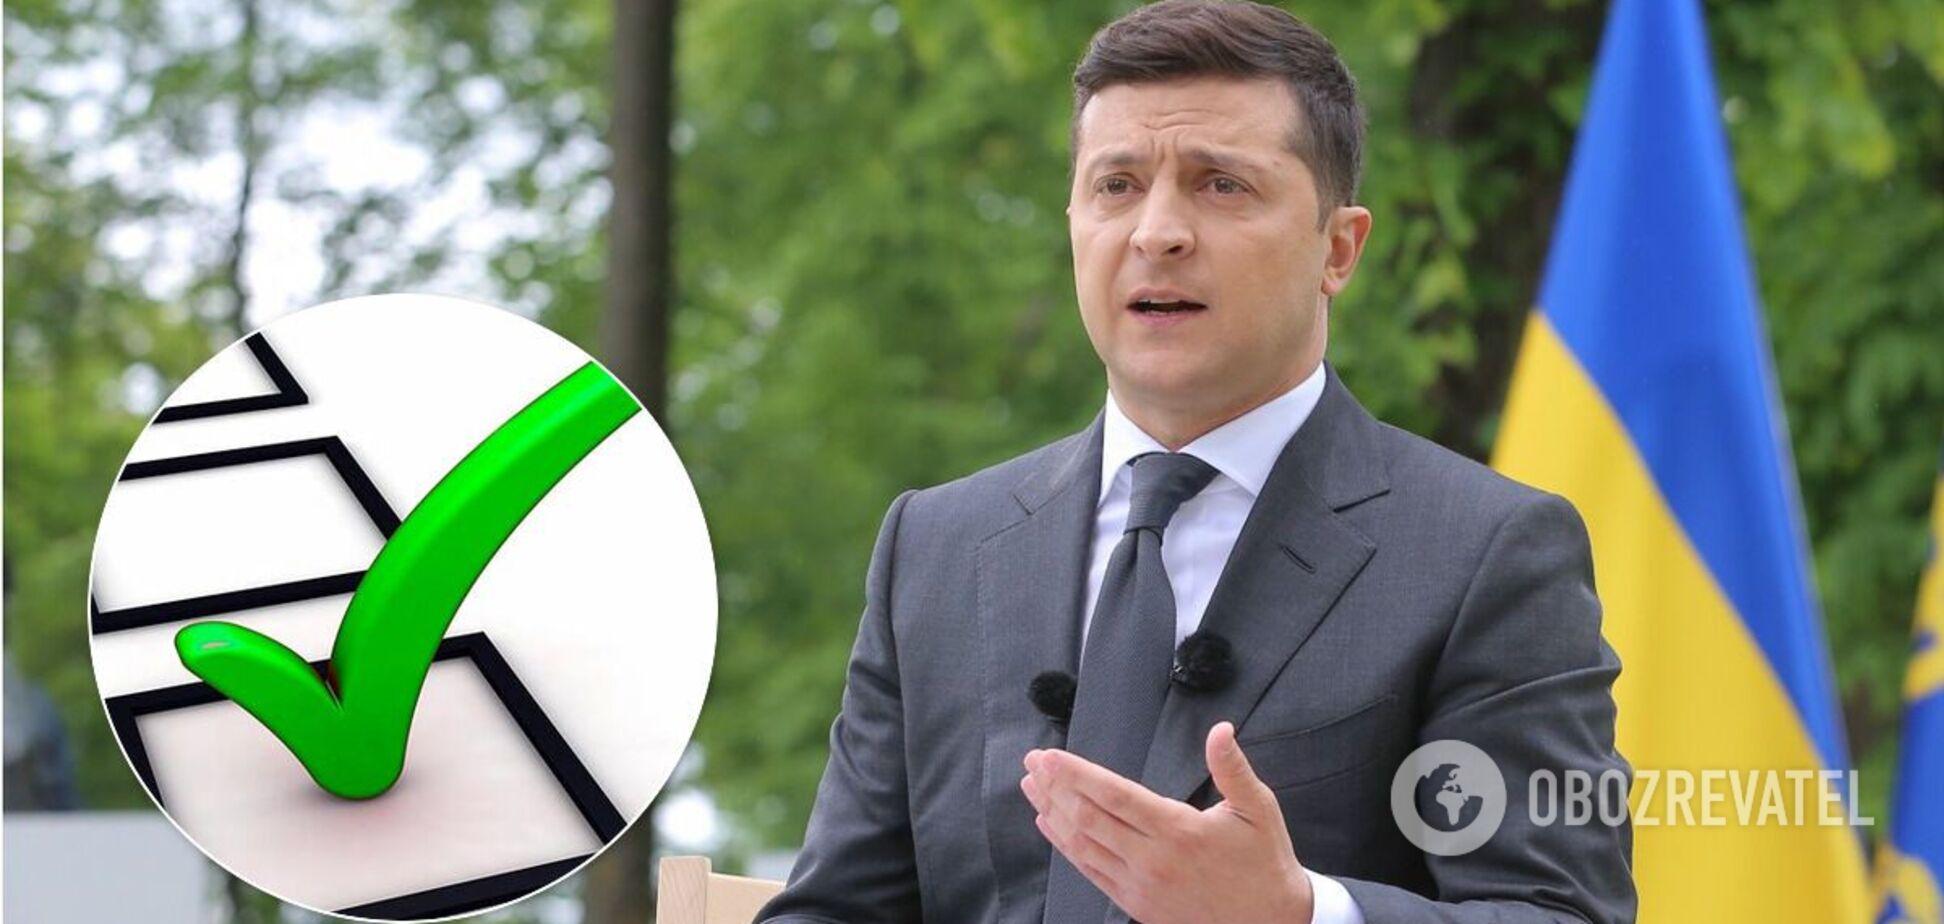 Зеленскому направили петицию относительно отставки президента